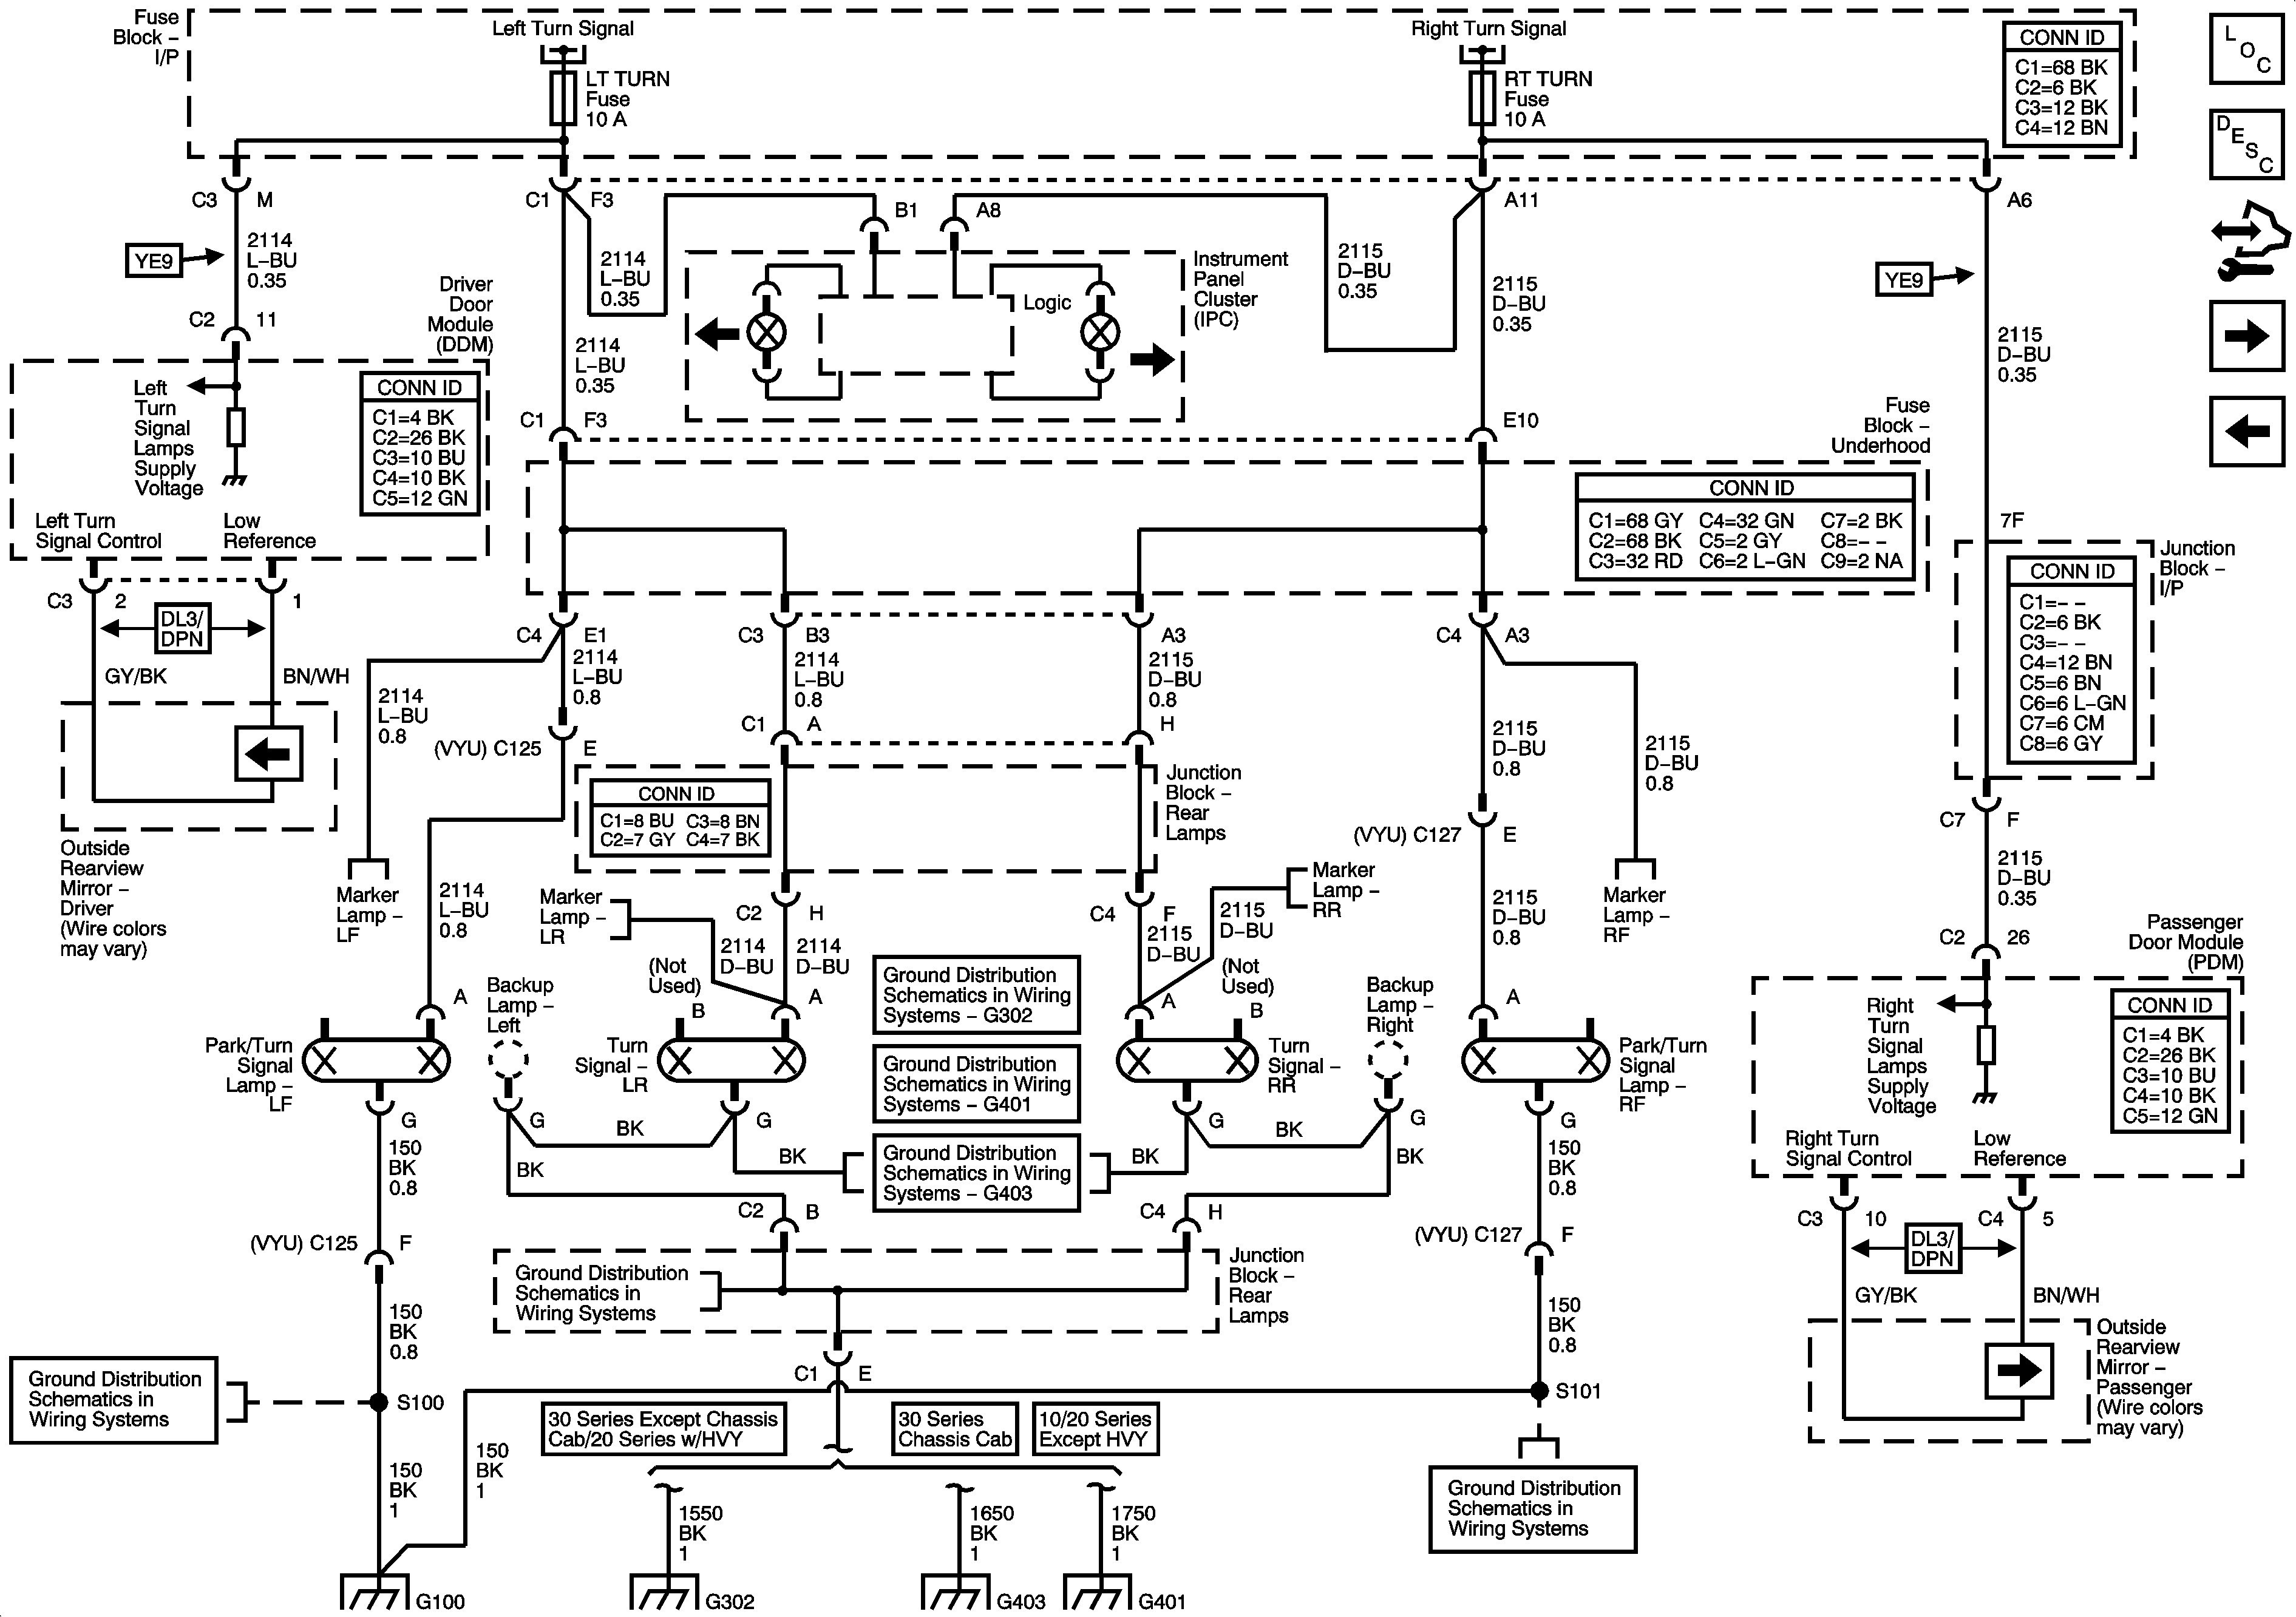 2009 Silverado Wiring Diagram 5 3 Wiring Harness and Puter Wiring Diagram Of 2009 Silverado Wiring Diagram